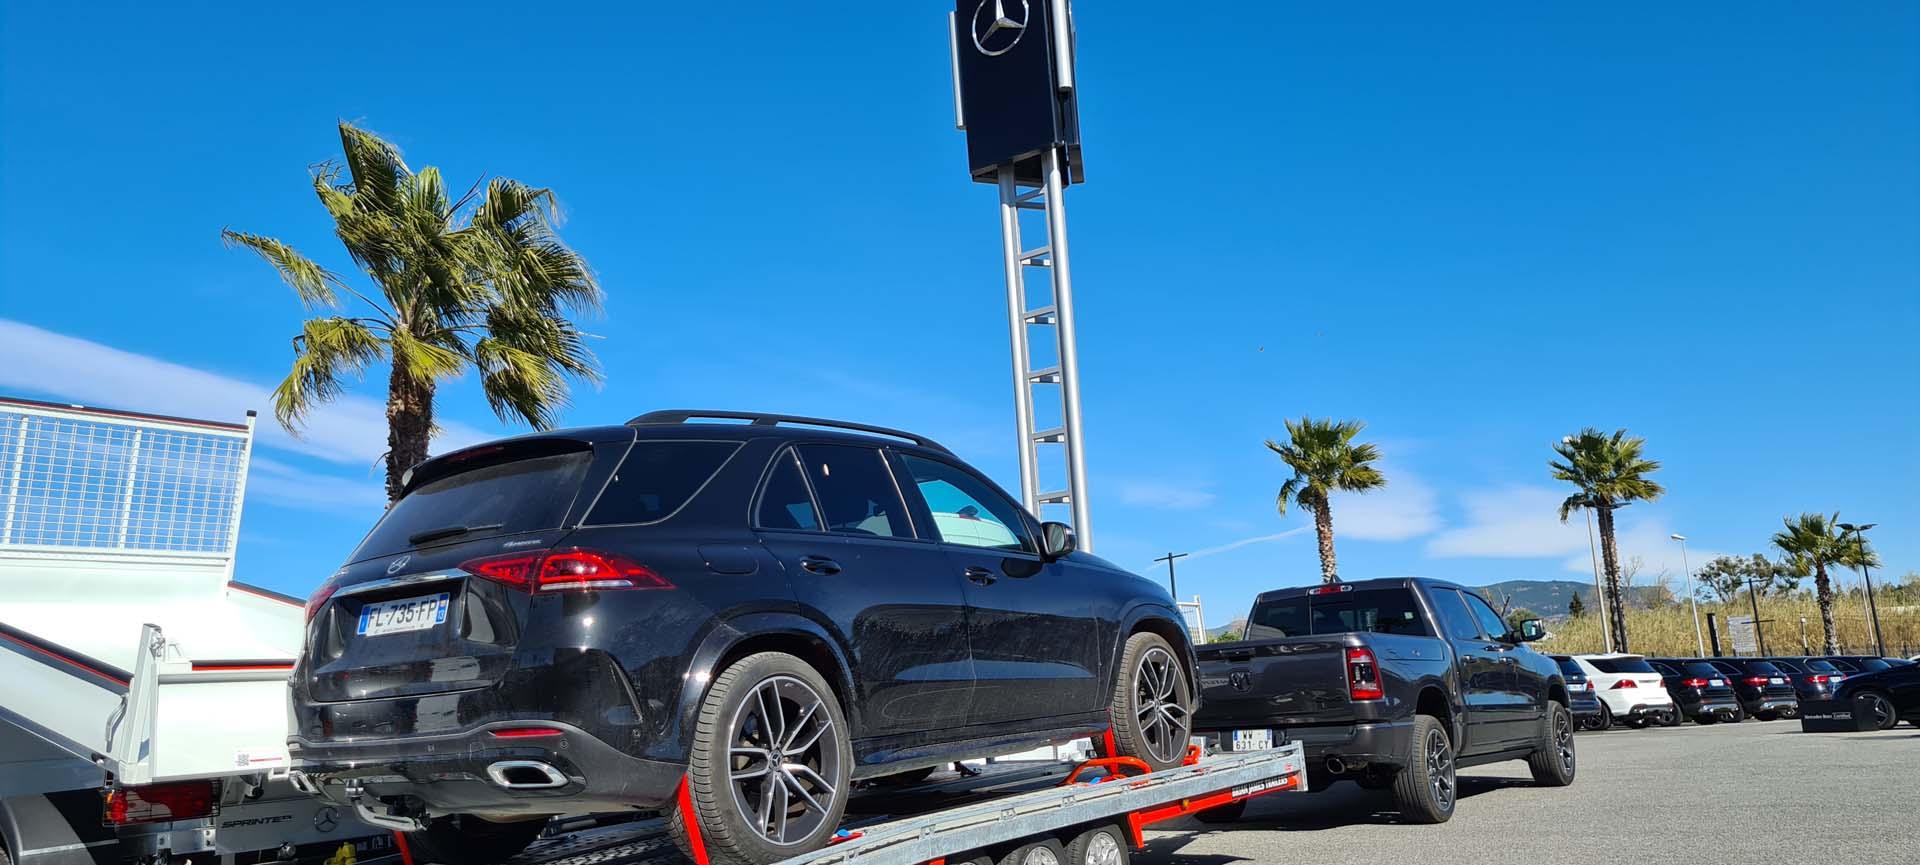 Livraison GLE SUV Mercedes-benz